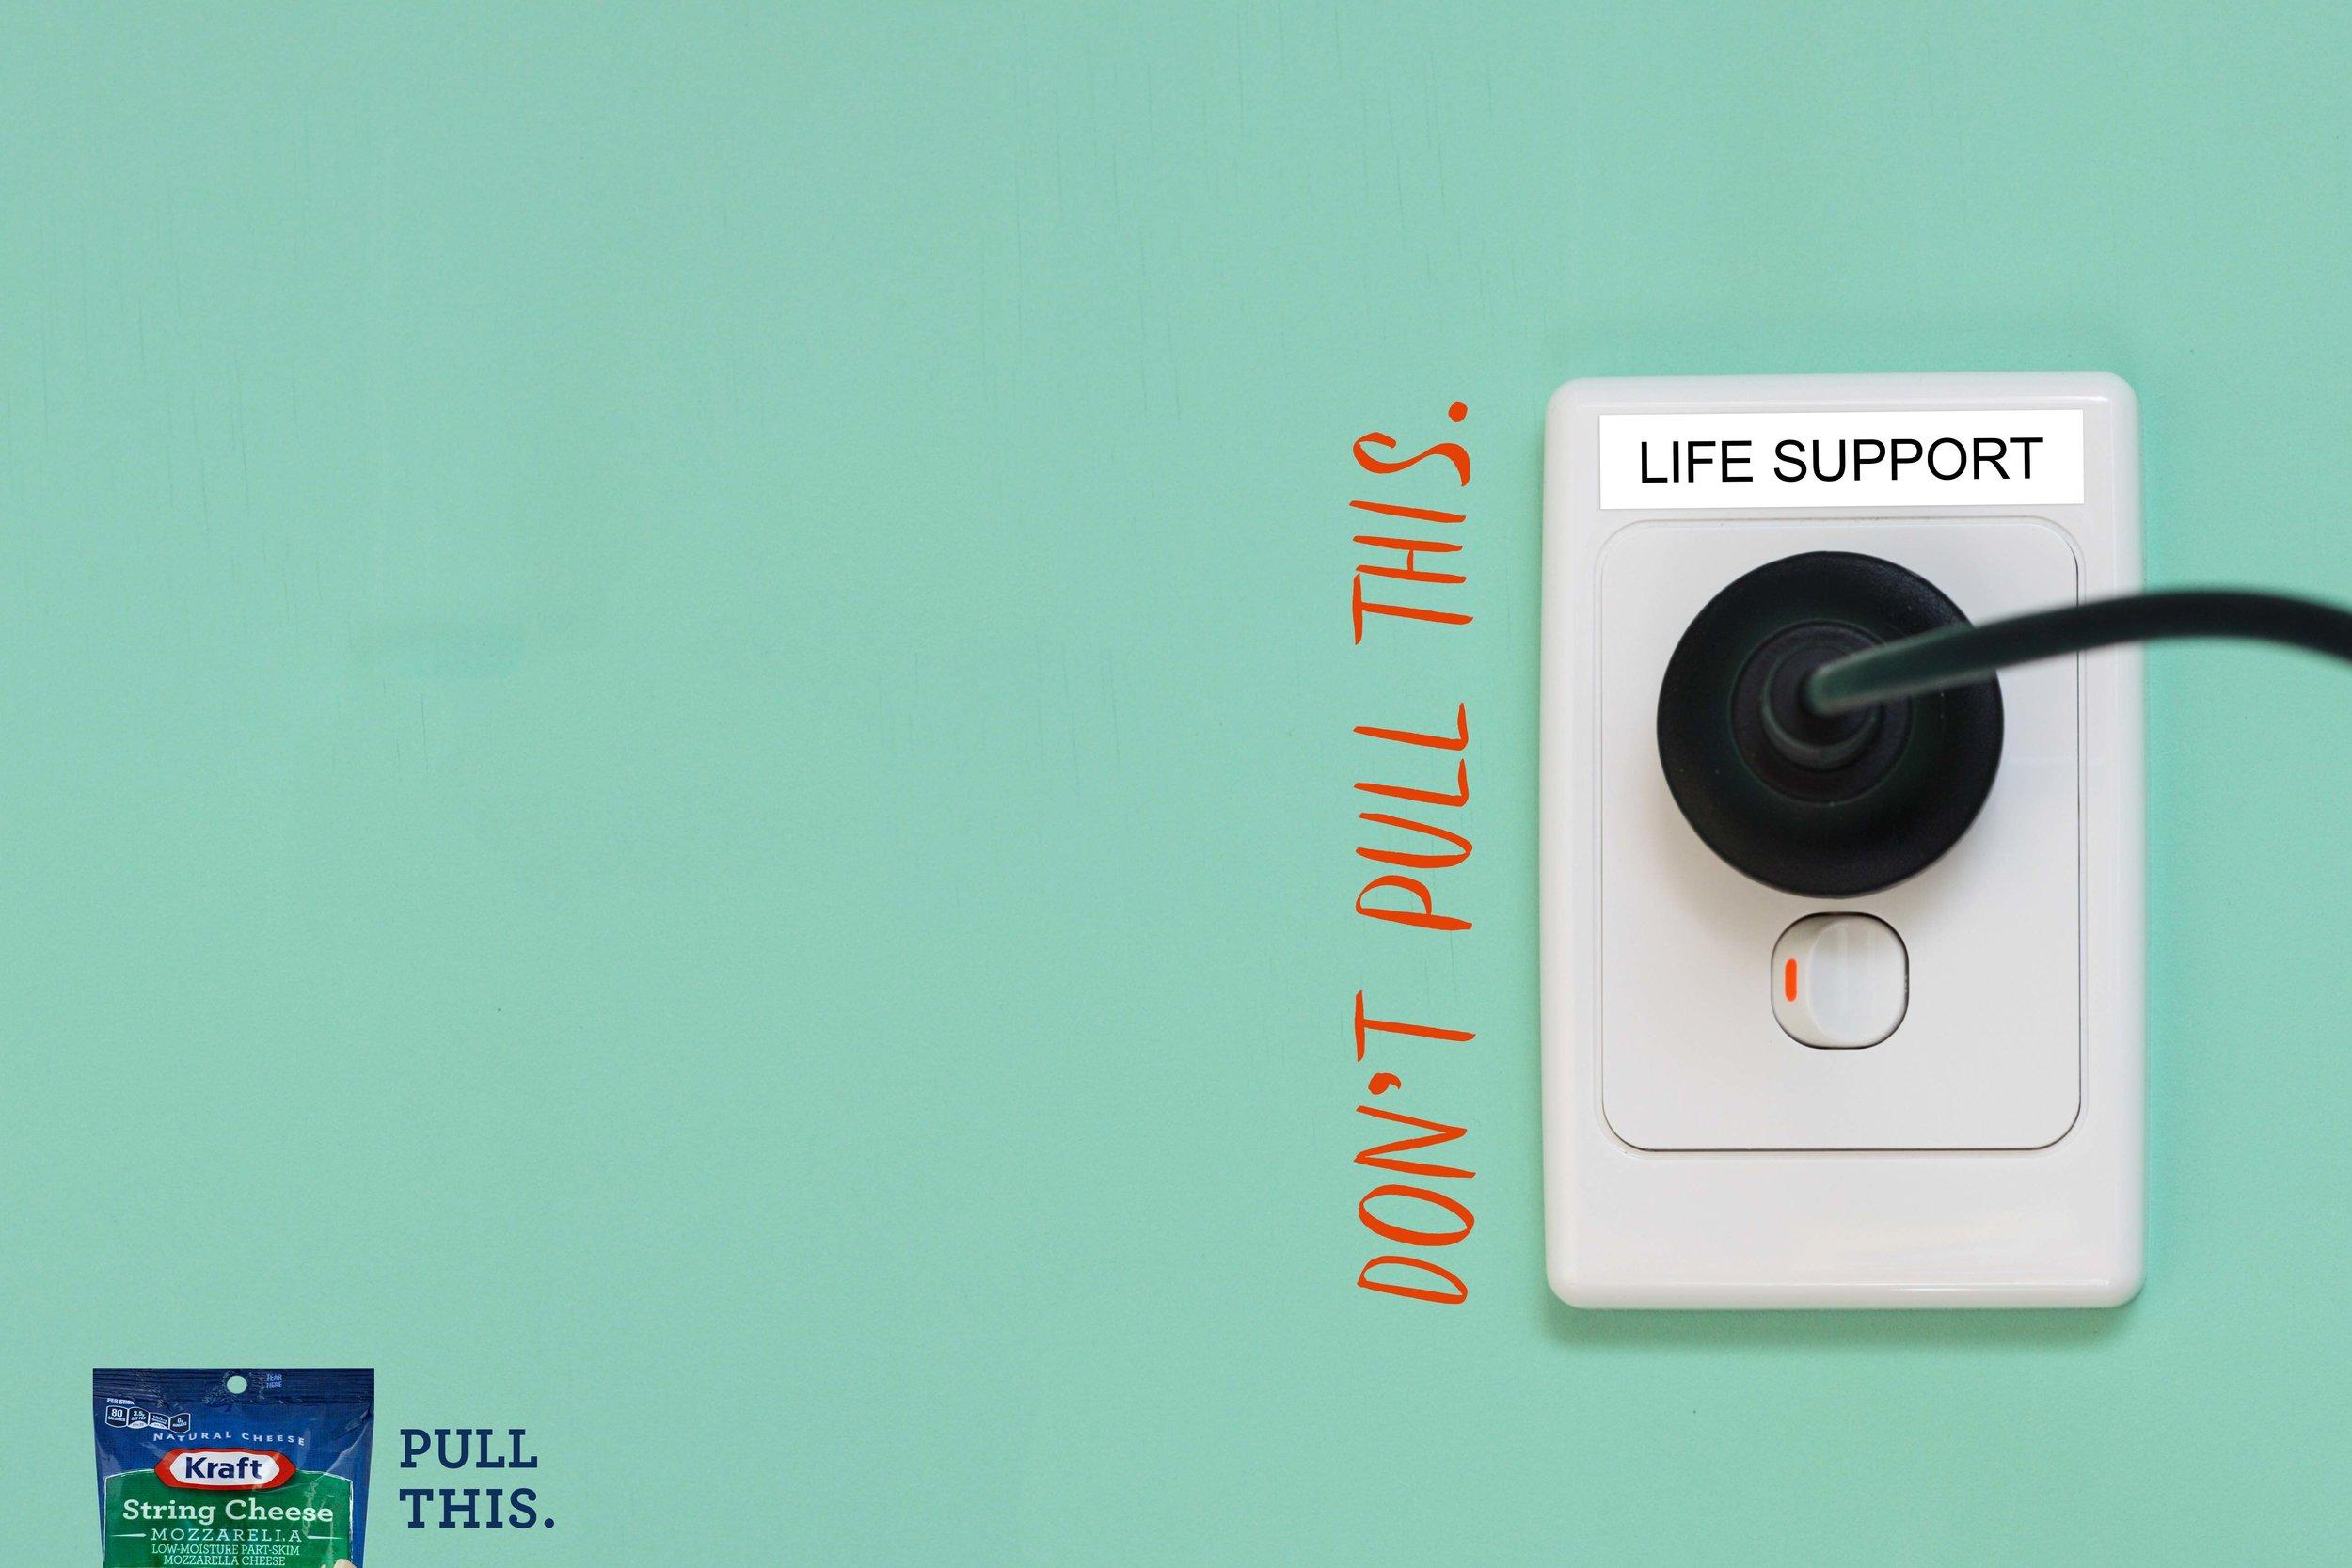 LifeSupport.jpg